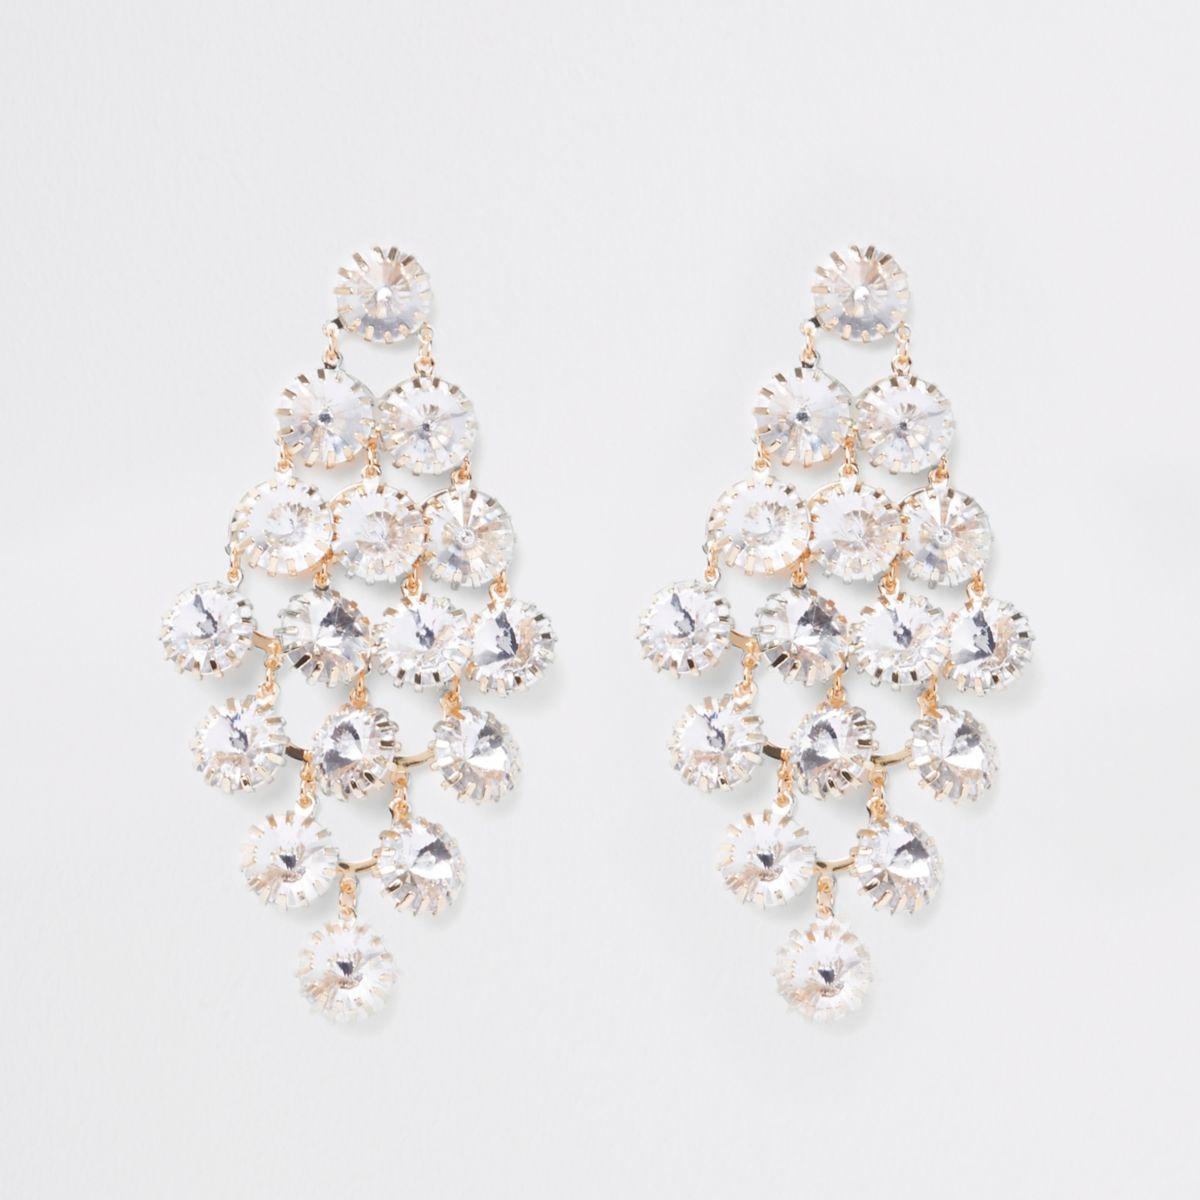 Gold tone diamante encrusted drop earrings